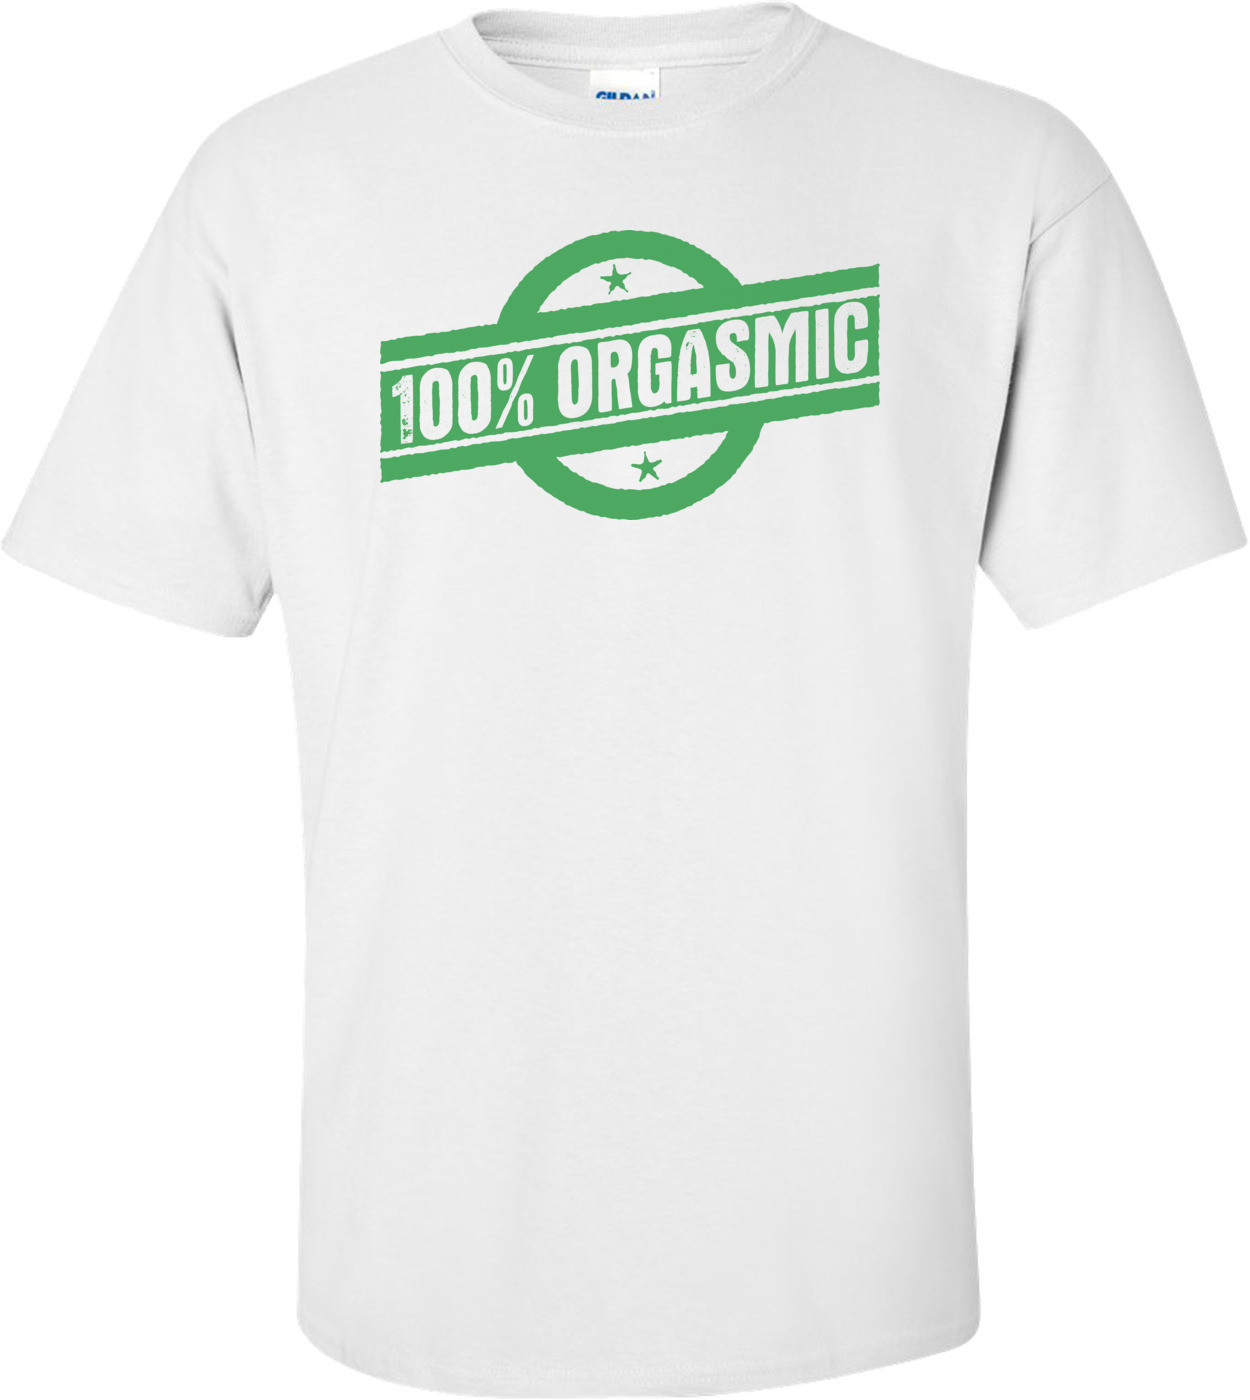 100% Orgasmic T-shirt